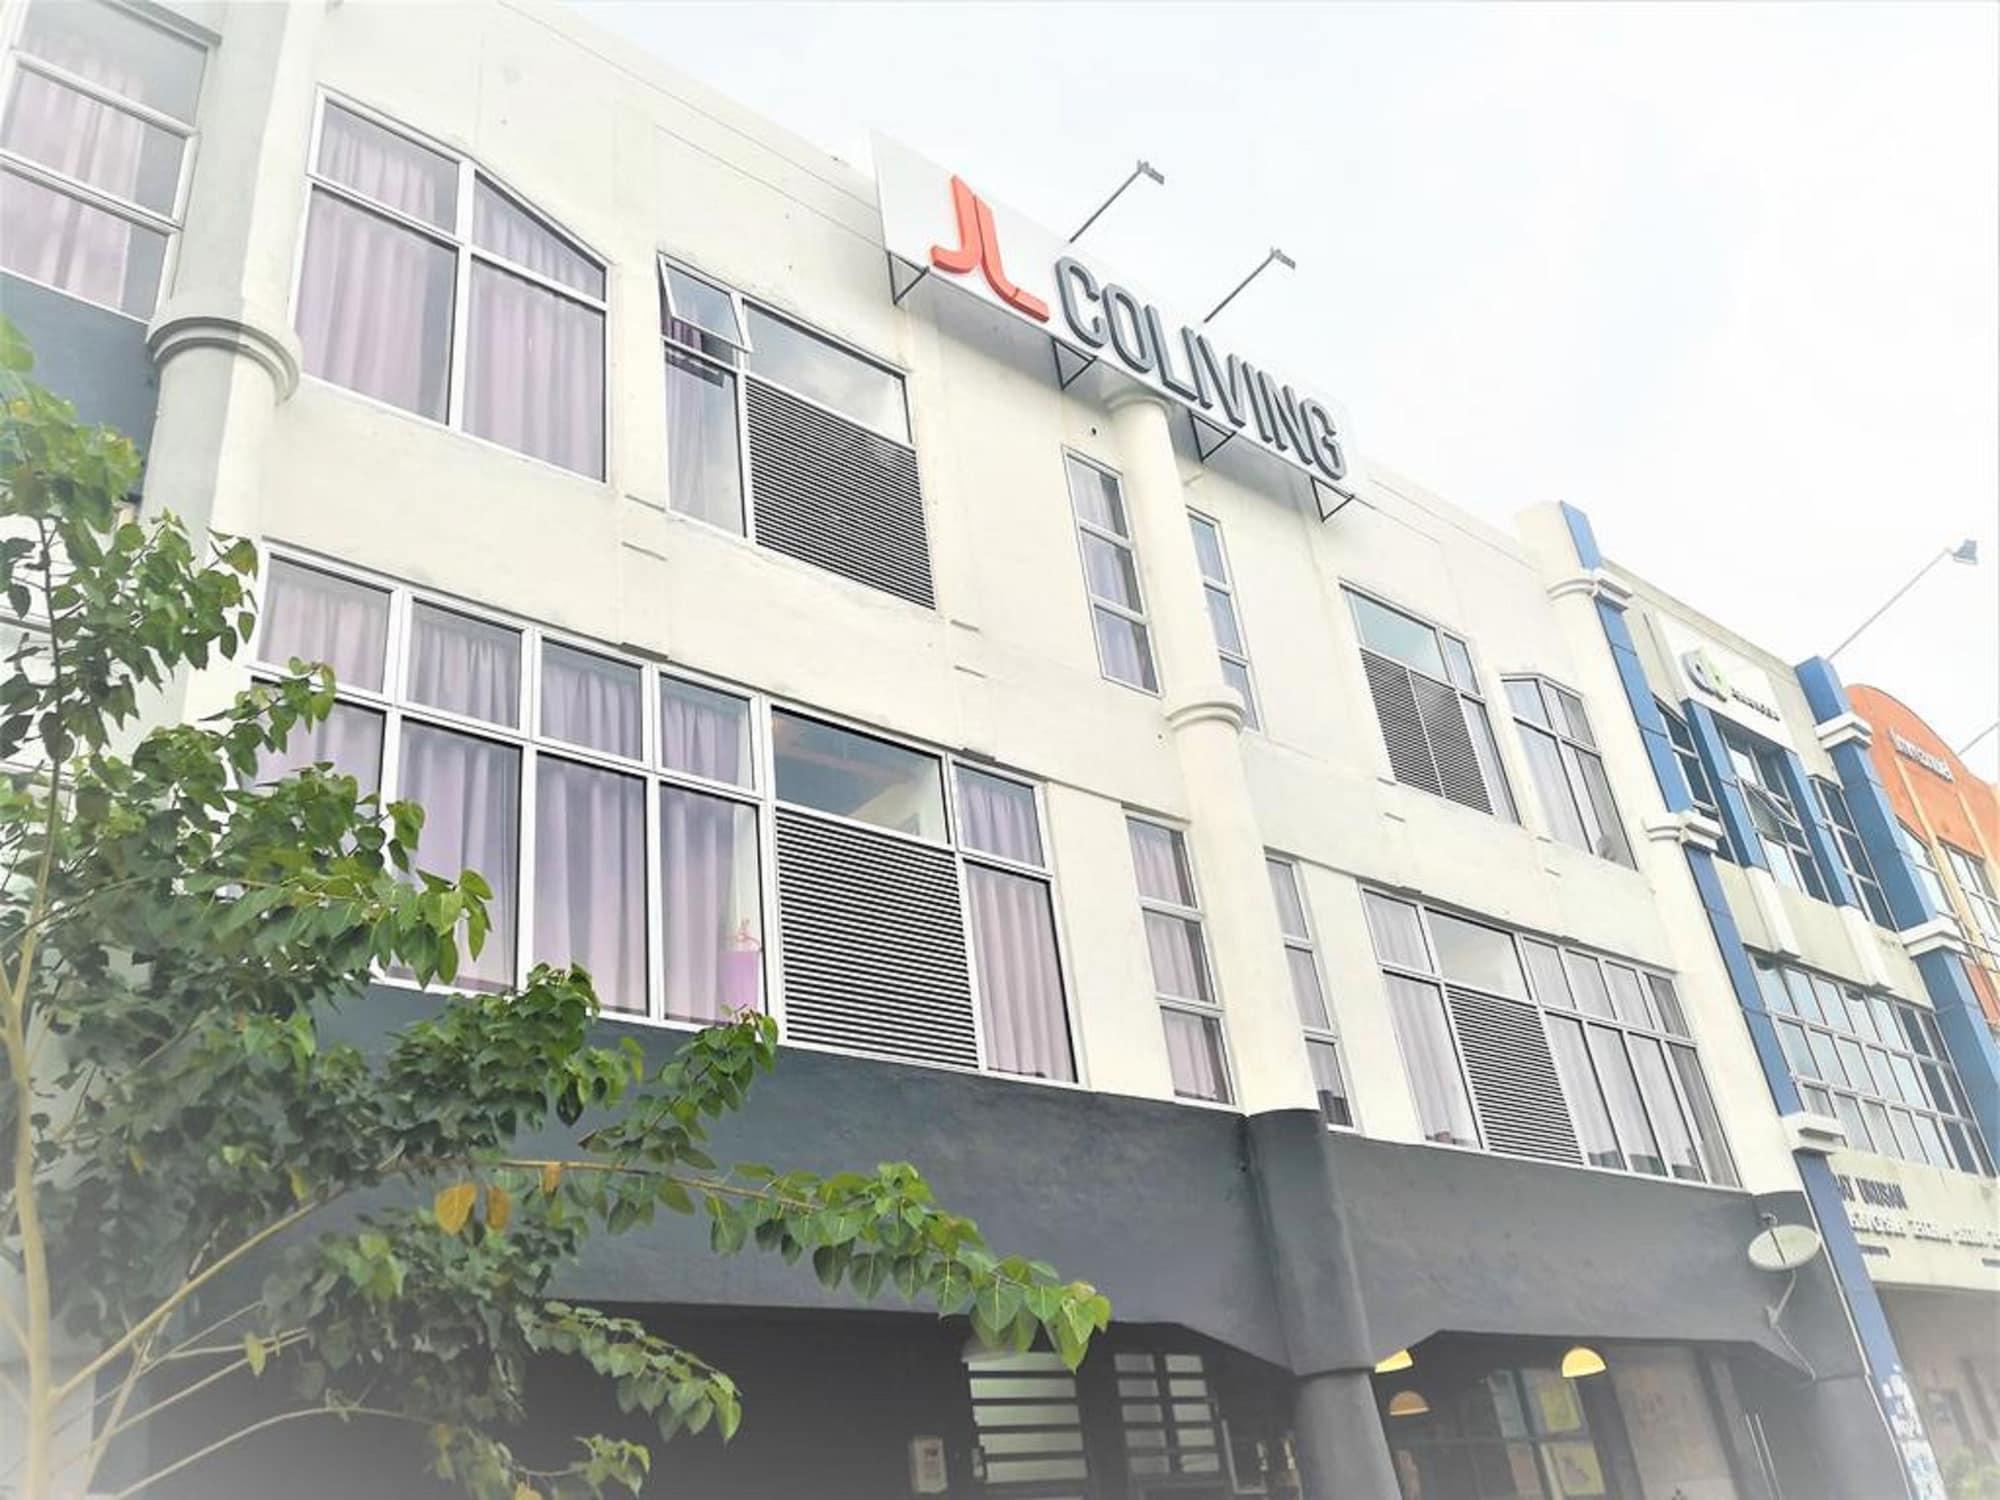 MU Home - JL Co-living USJ 21, Kuala Lumpur